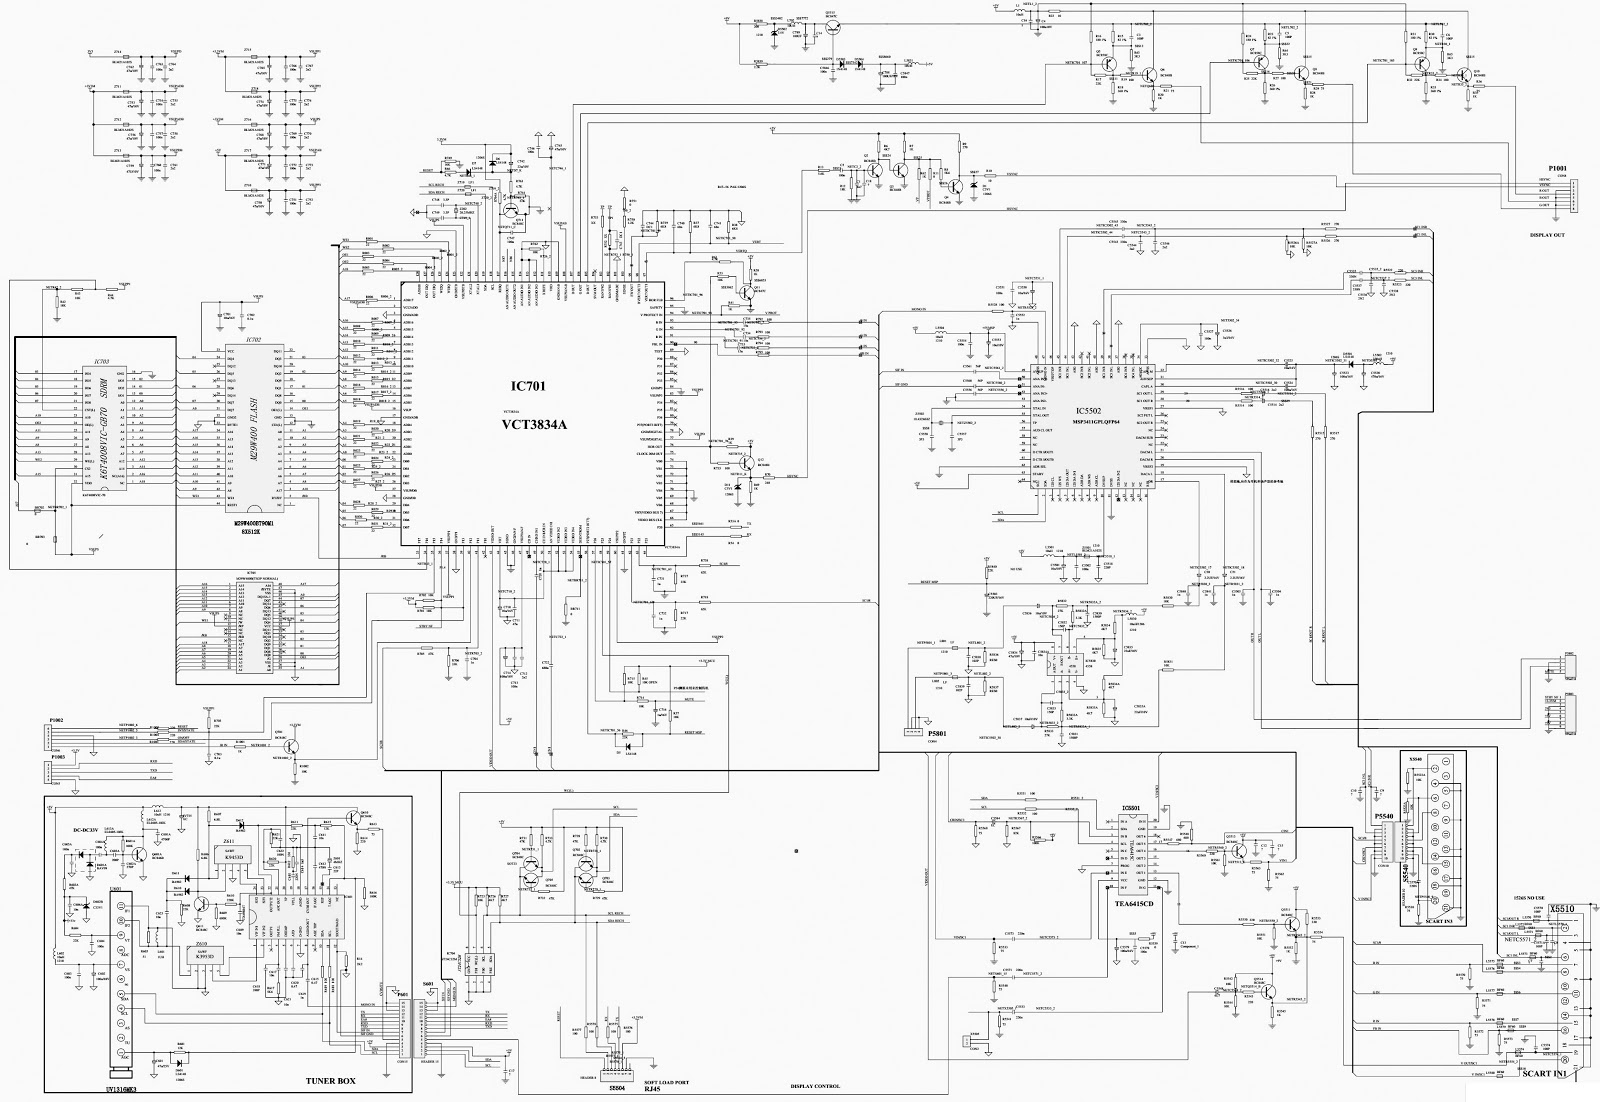 Hobart Am14 Wiring Diagram